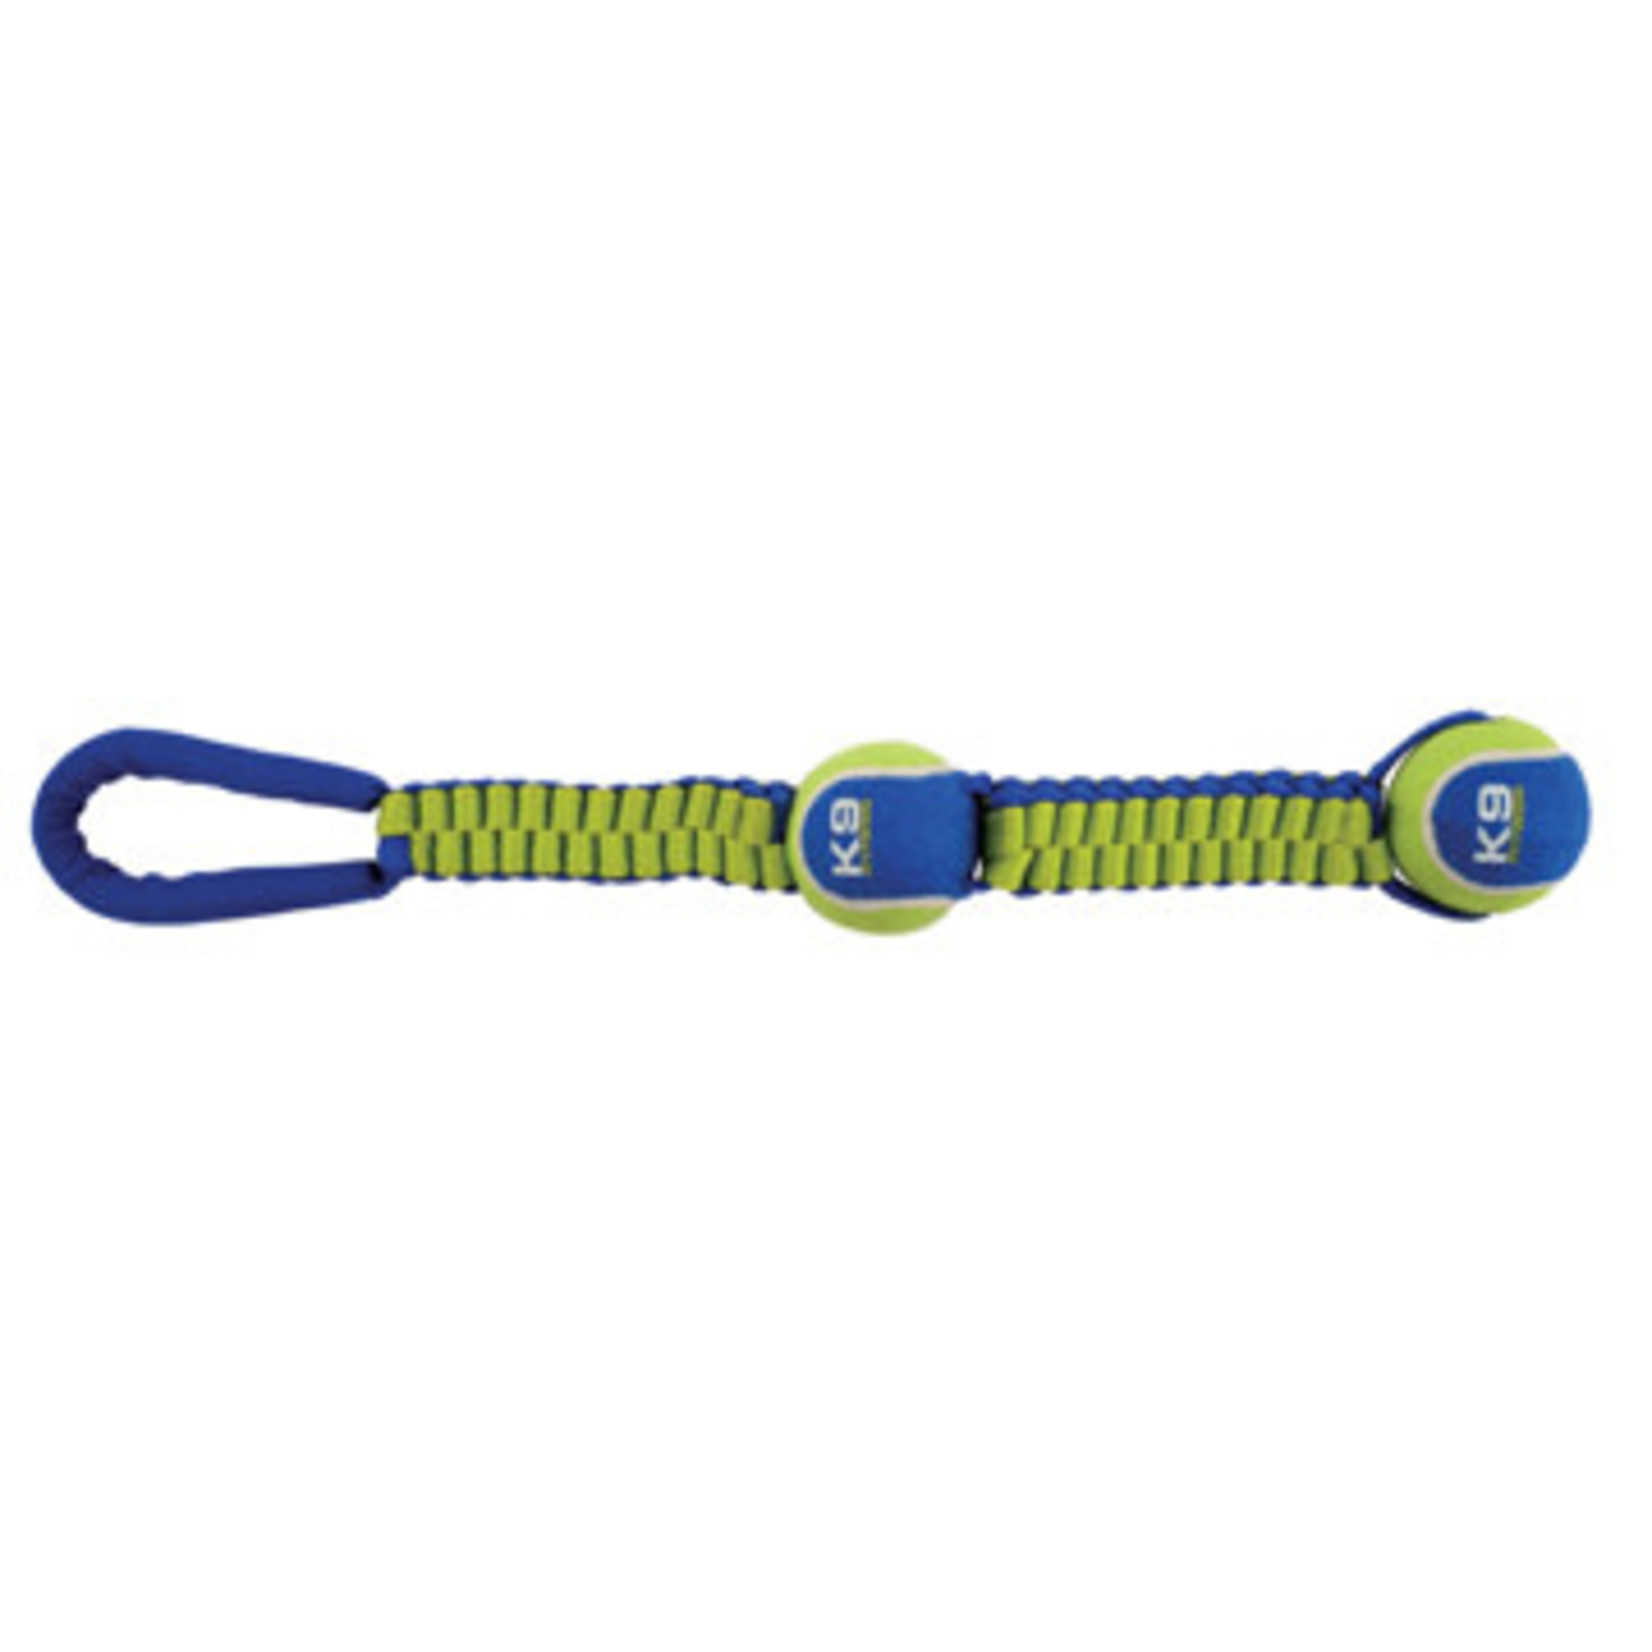 Zeus K9 Fitness Dog Tug Toy Double Tennis Ball